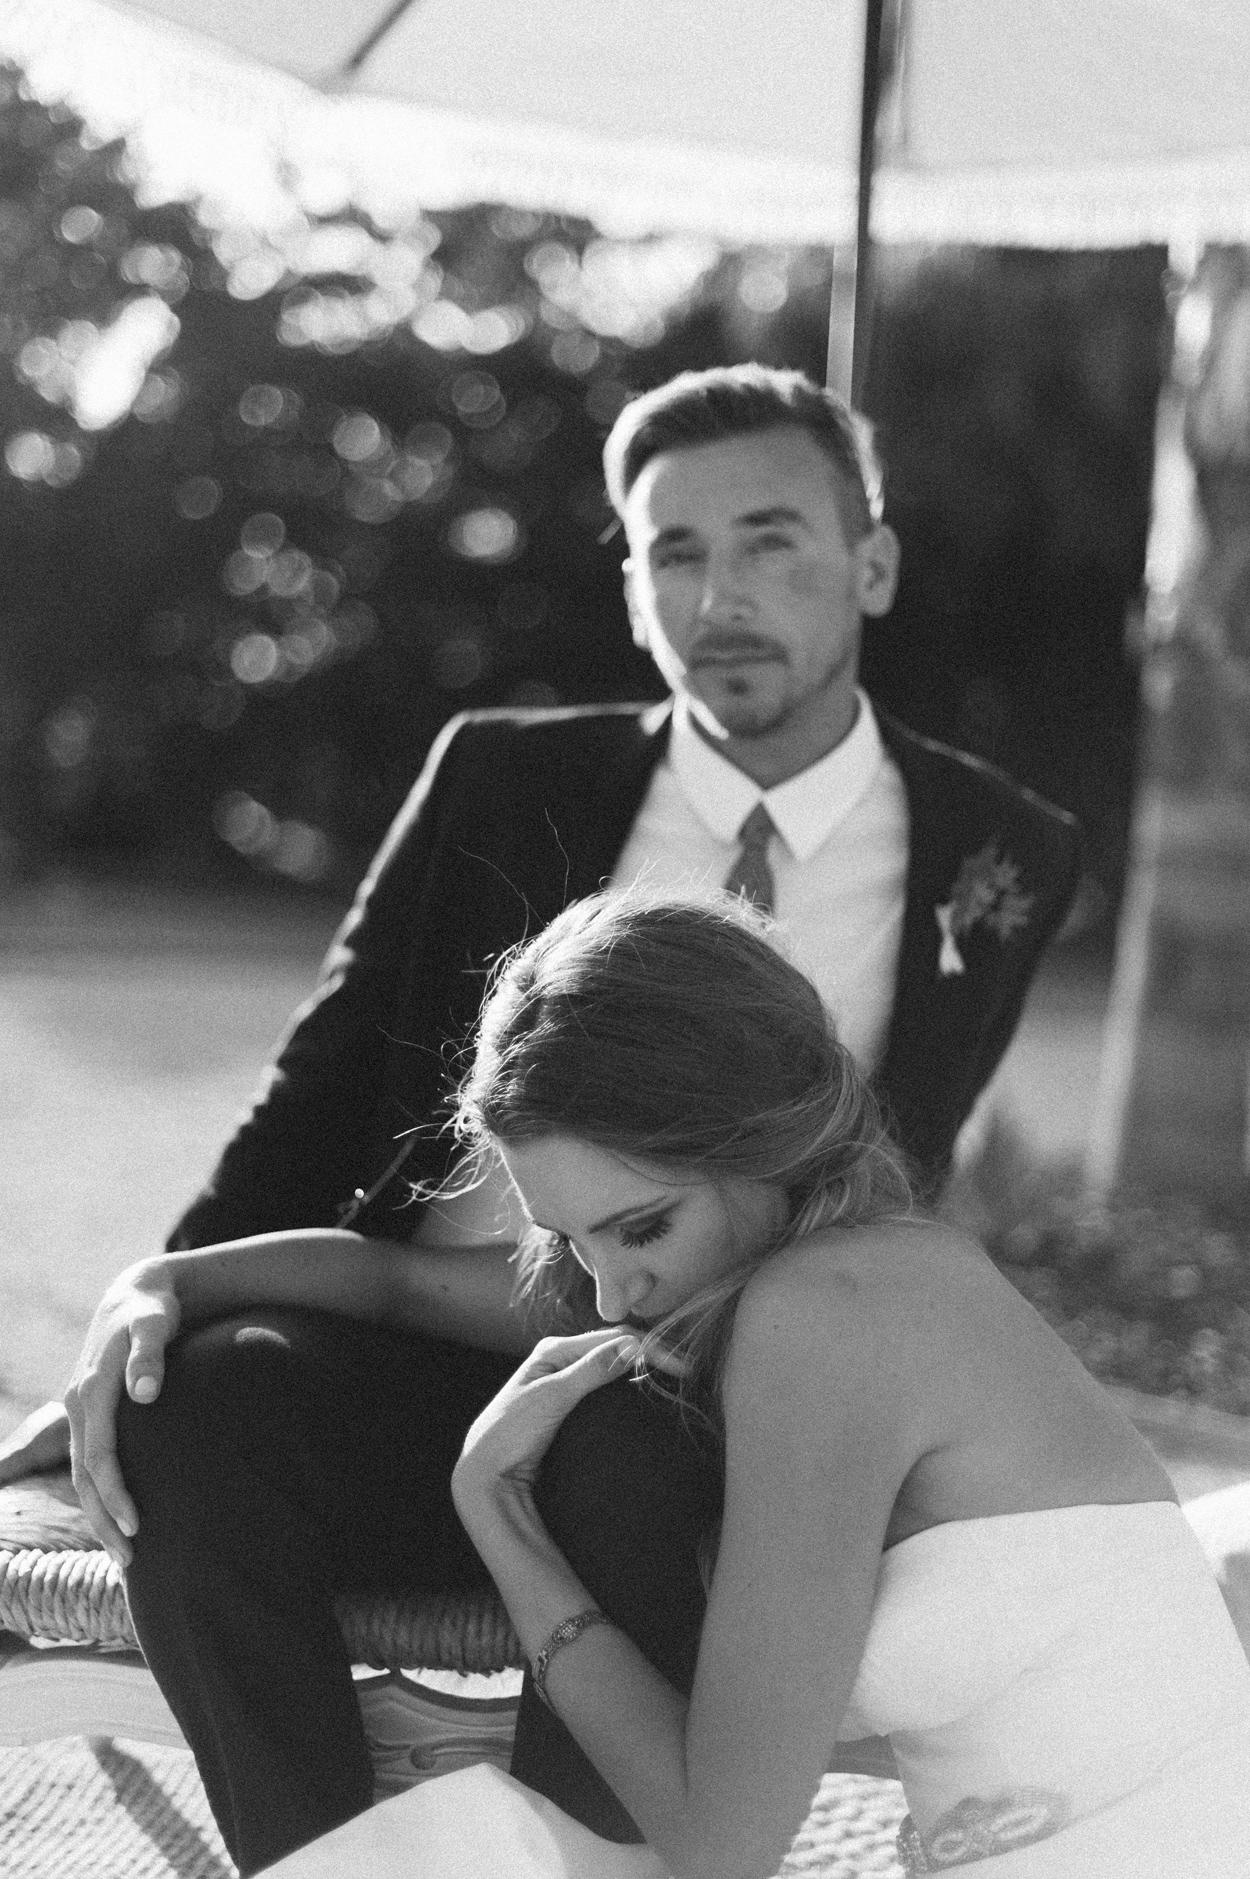 temecula_creek_inn_wedding_photographer0544b.jpg